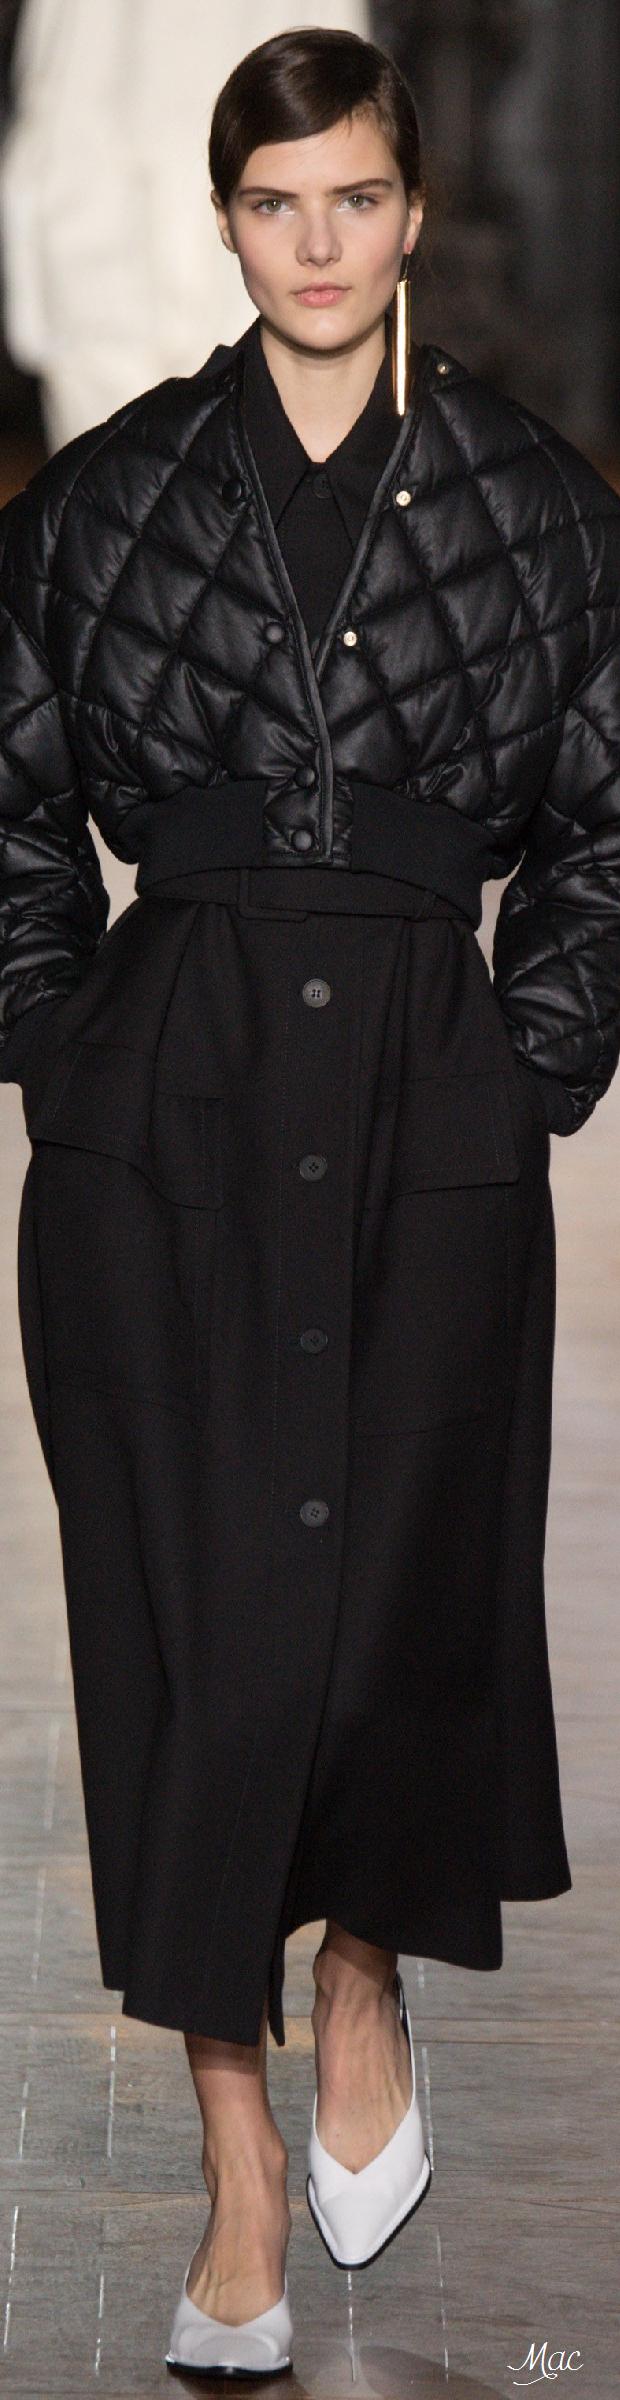 Fall 2016 Ready-to-Wear Stella McCartney